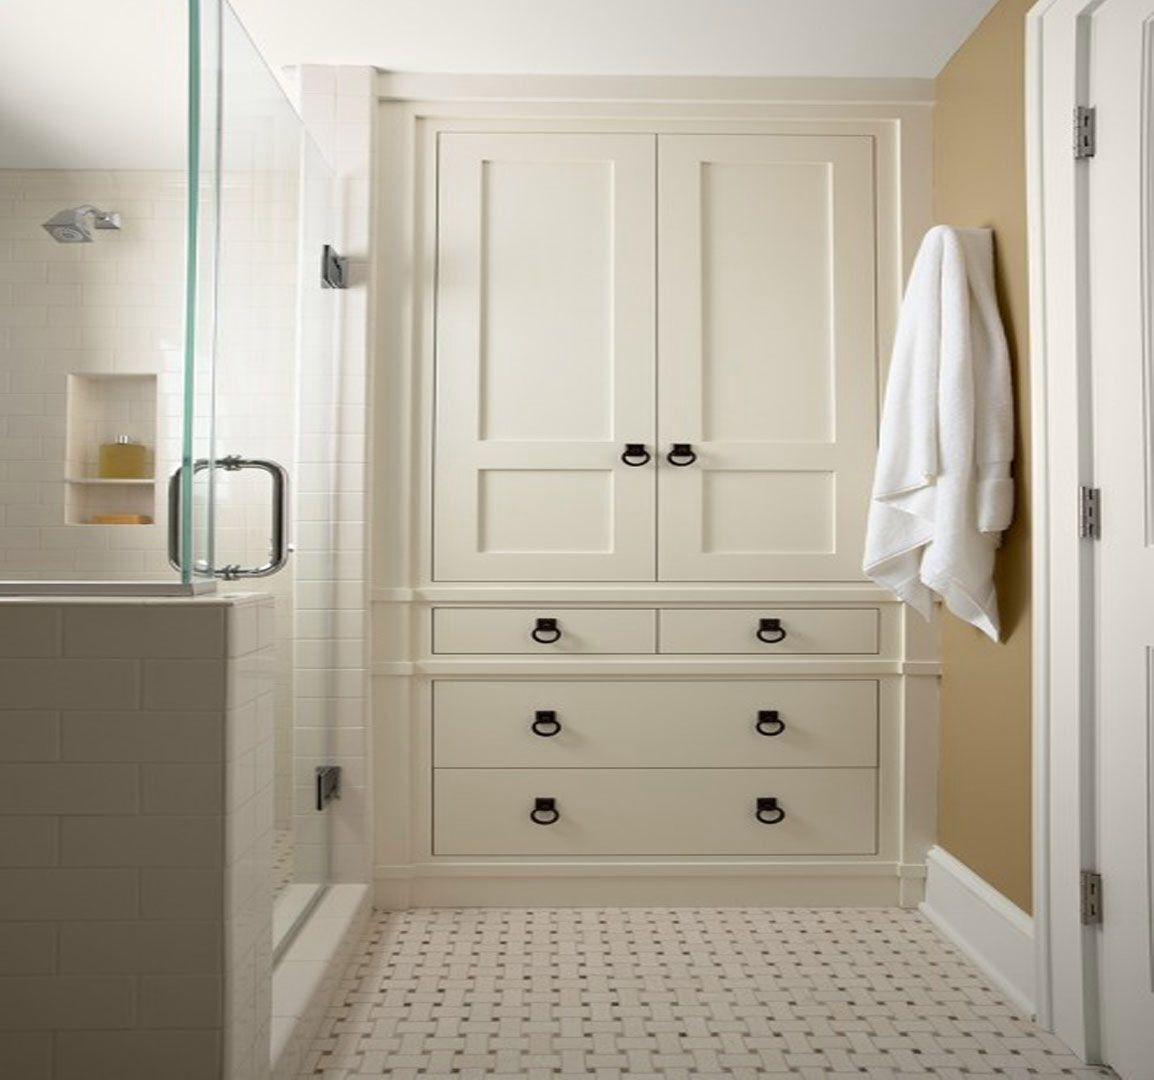 Love built-ins   Home & Decor   Pinterest   Built ins, Bathroom ...